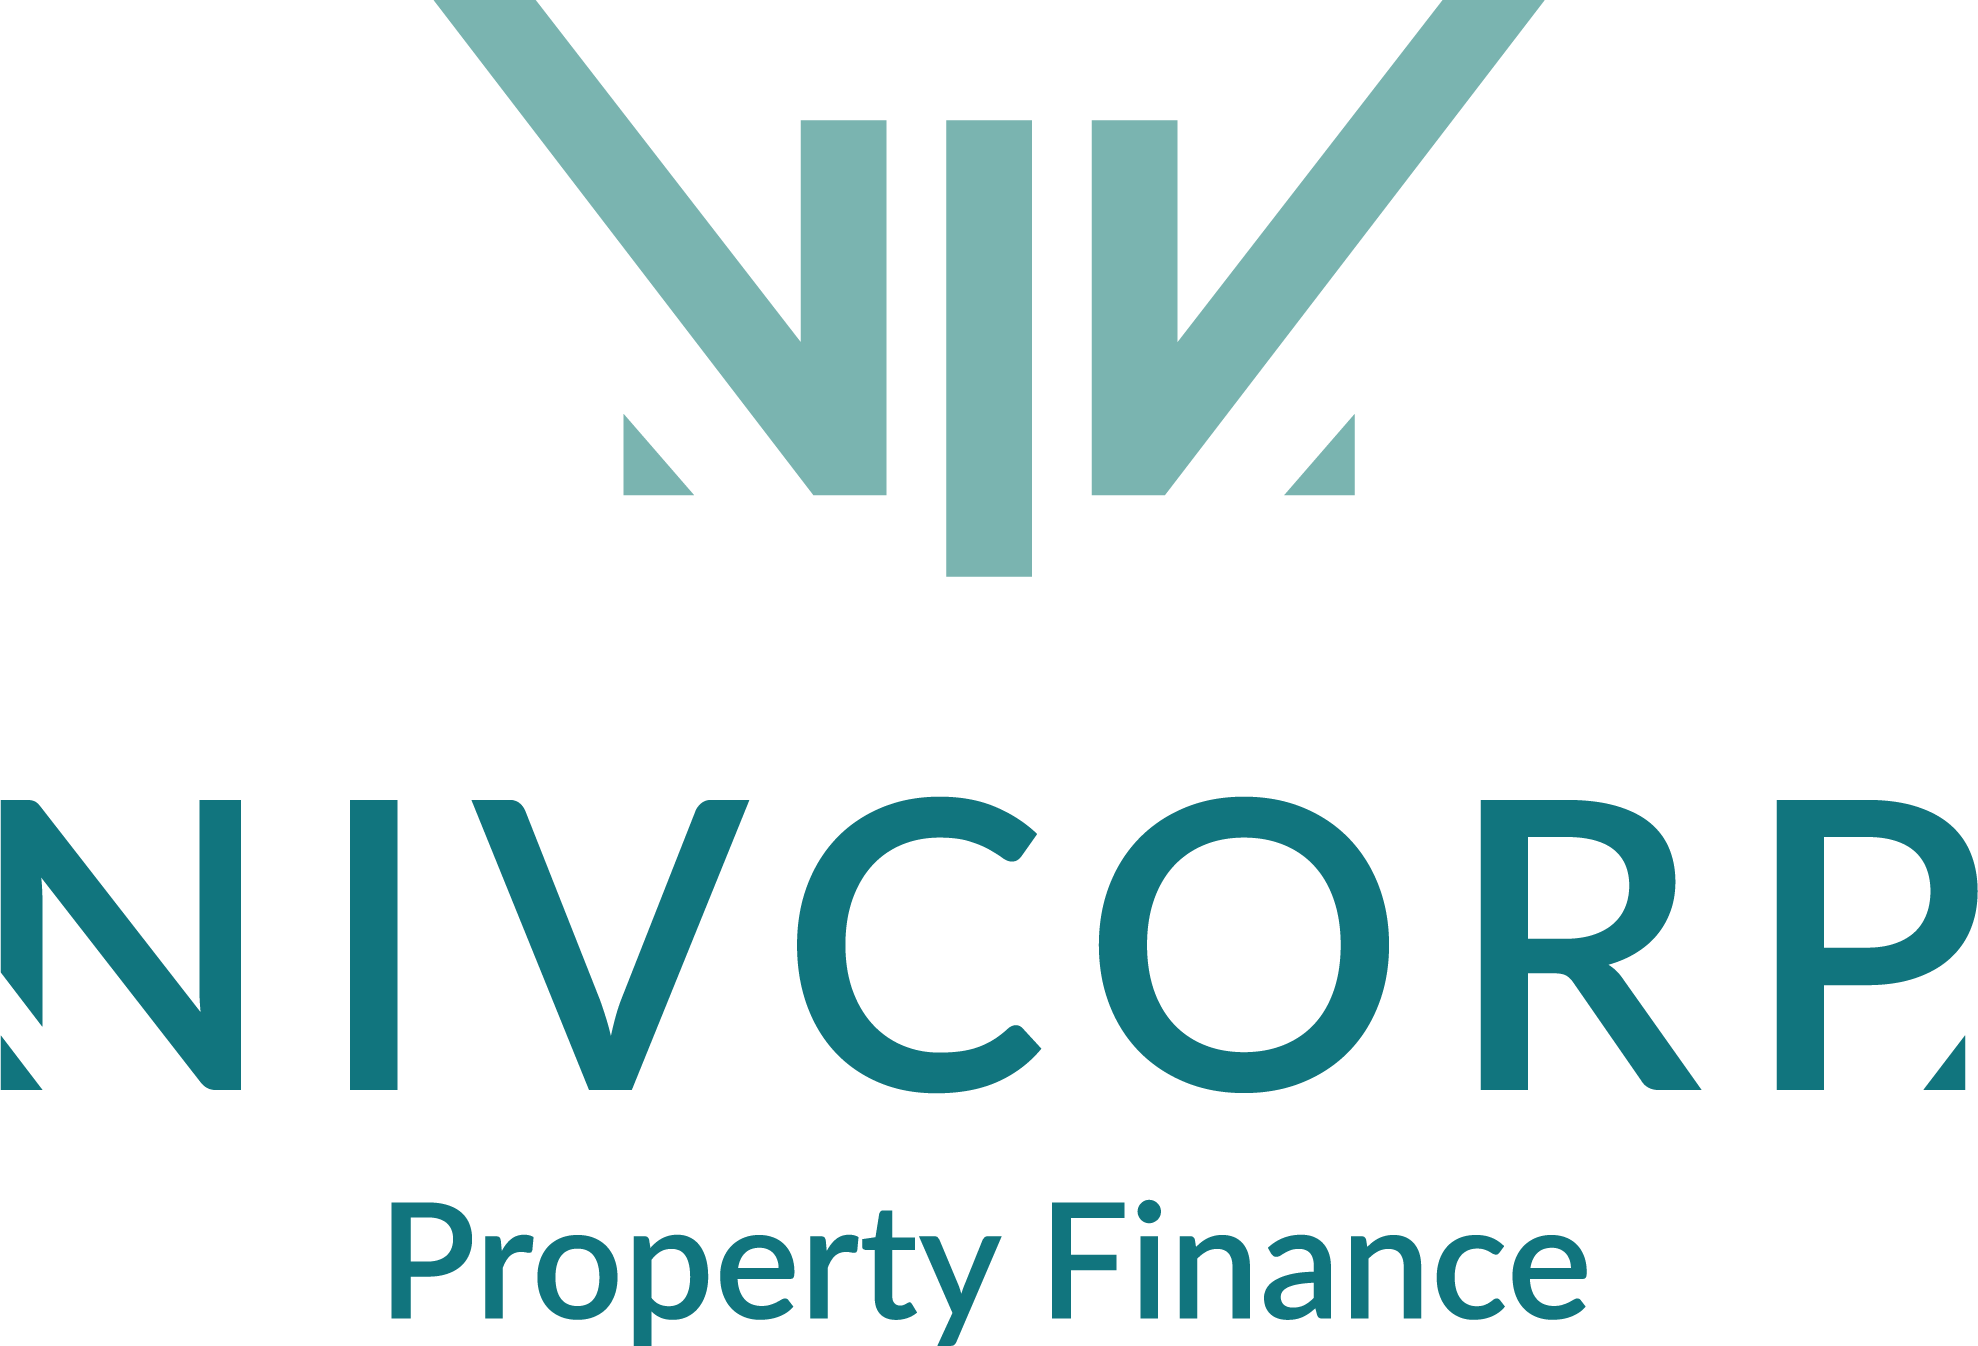 NIVCORP_PROPERTY FINANCE_LOGO_FULL_RGB.png